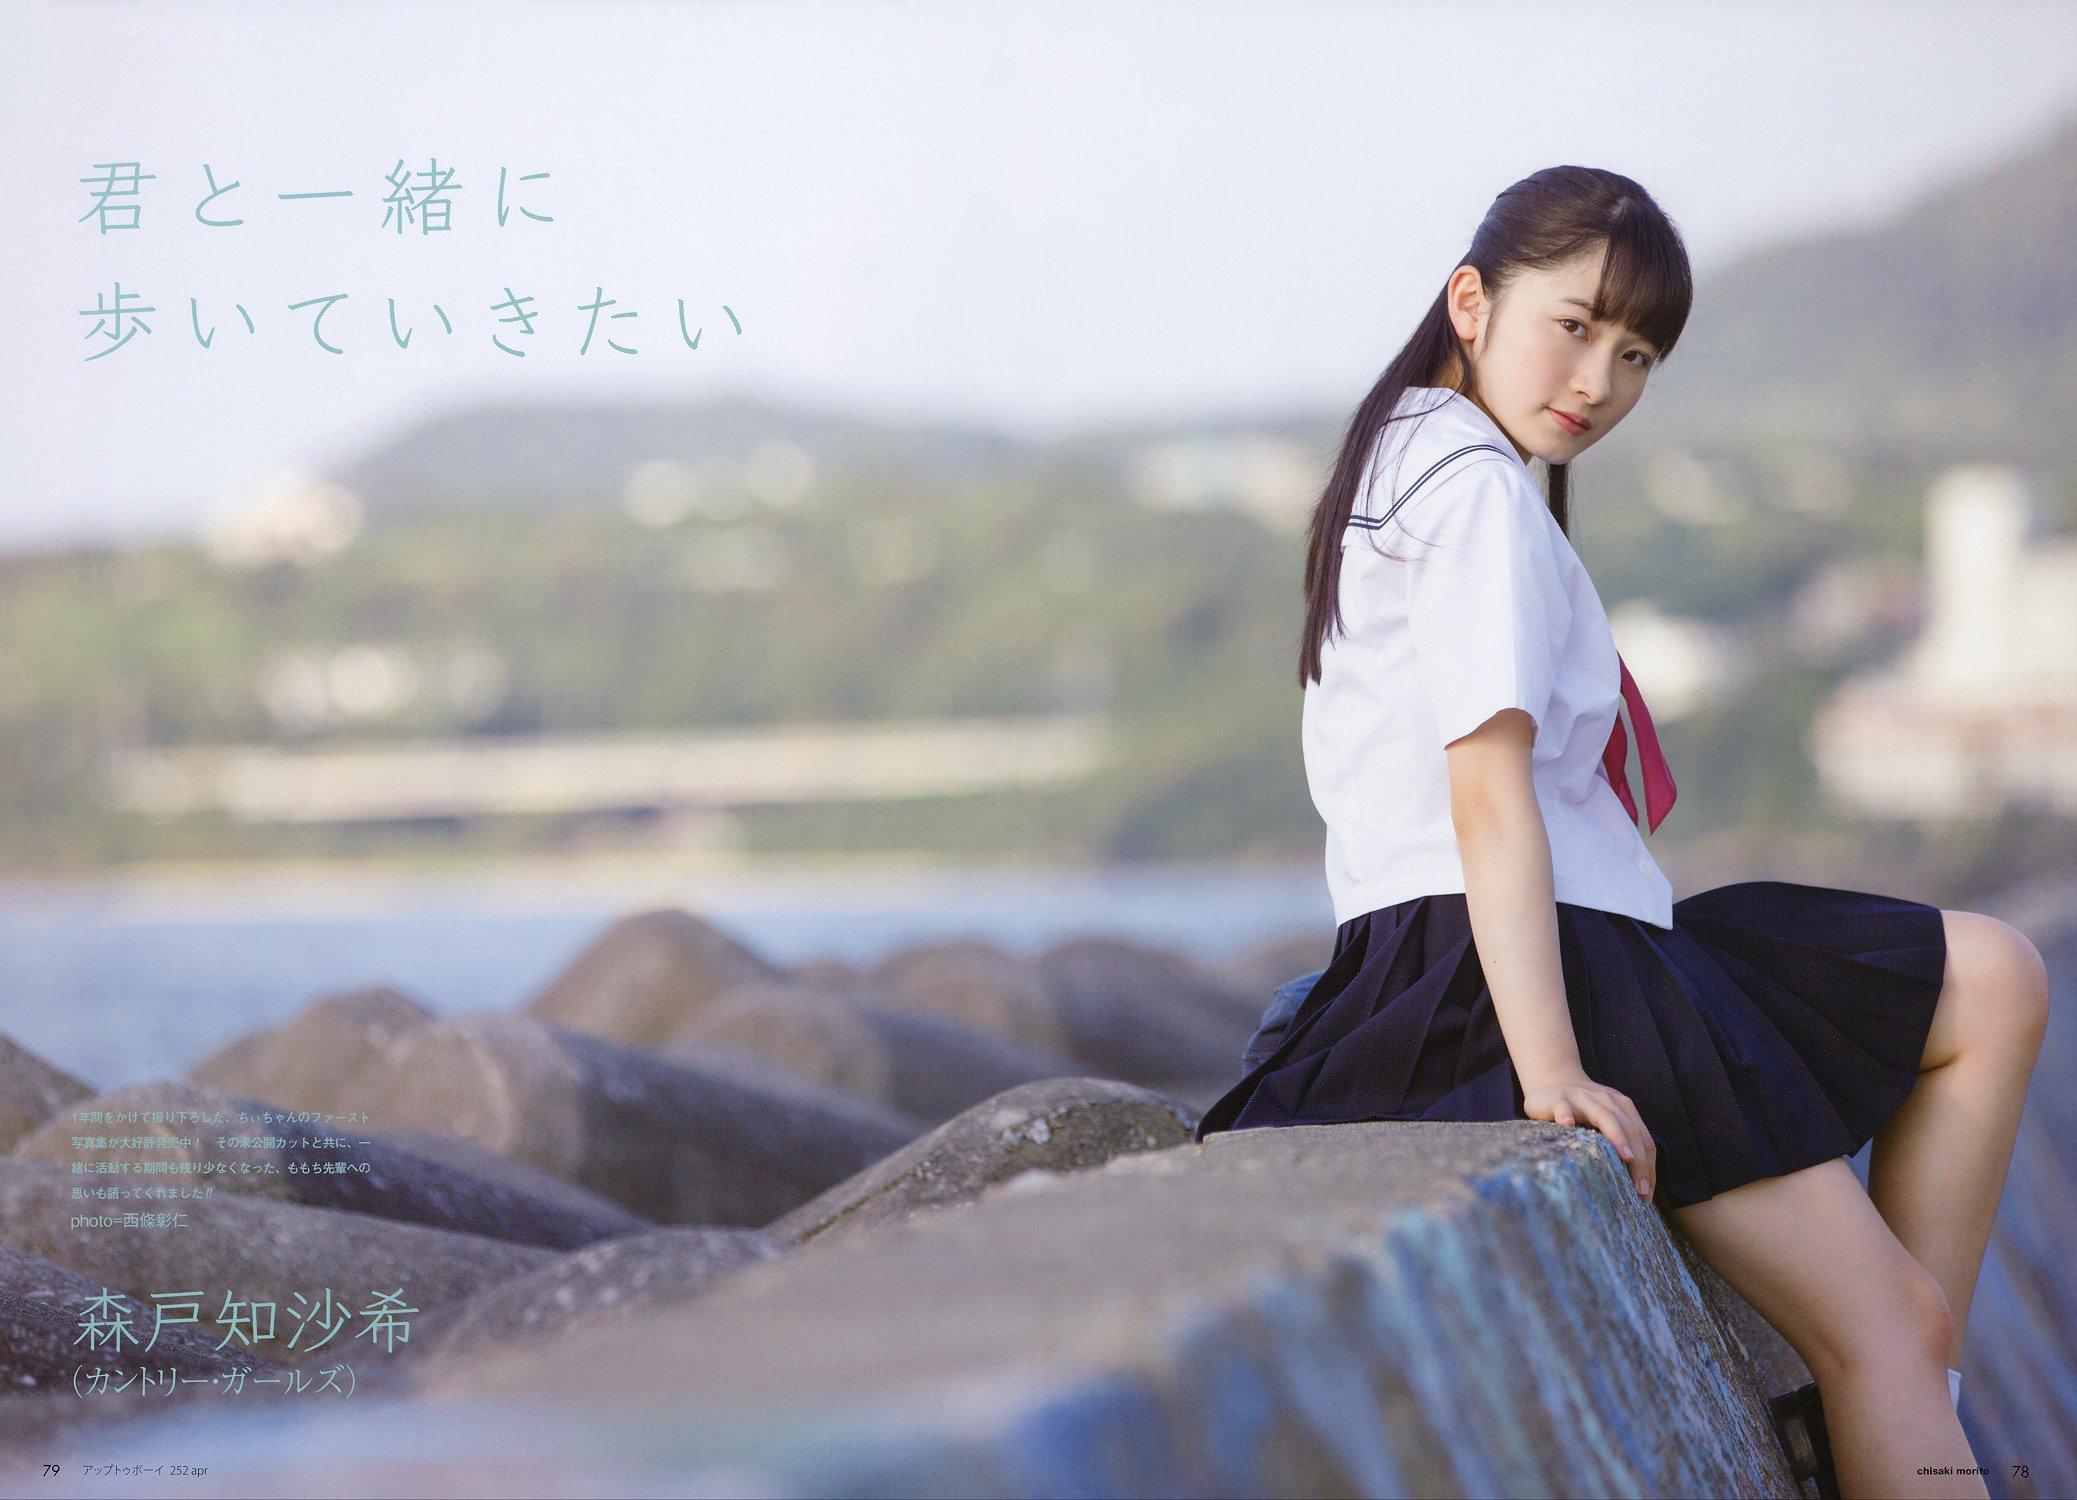 Country Girls (カントリー・ガールズ), Magazine, Morito Chisaki, UTB ~ Up To Boy